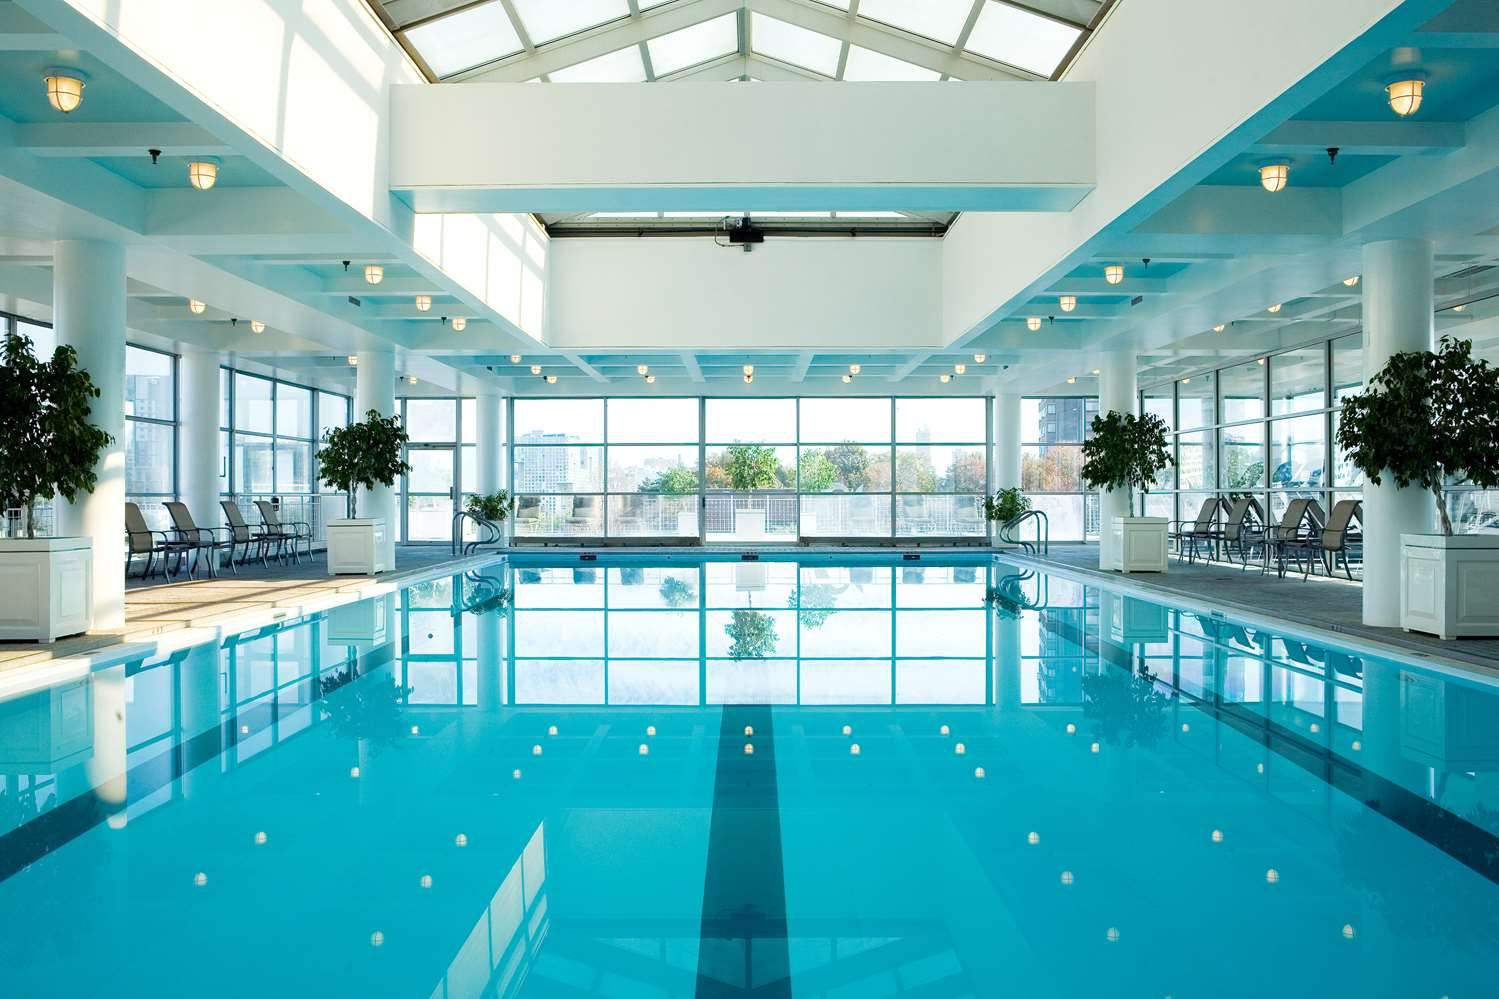 Pool - Hyatt Regency Hotel Cambridge